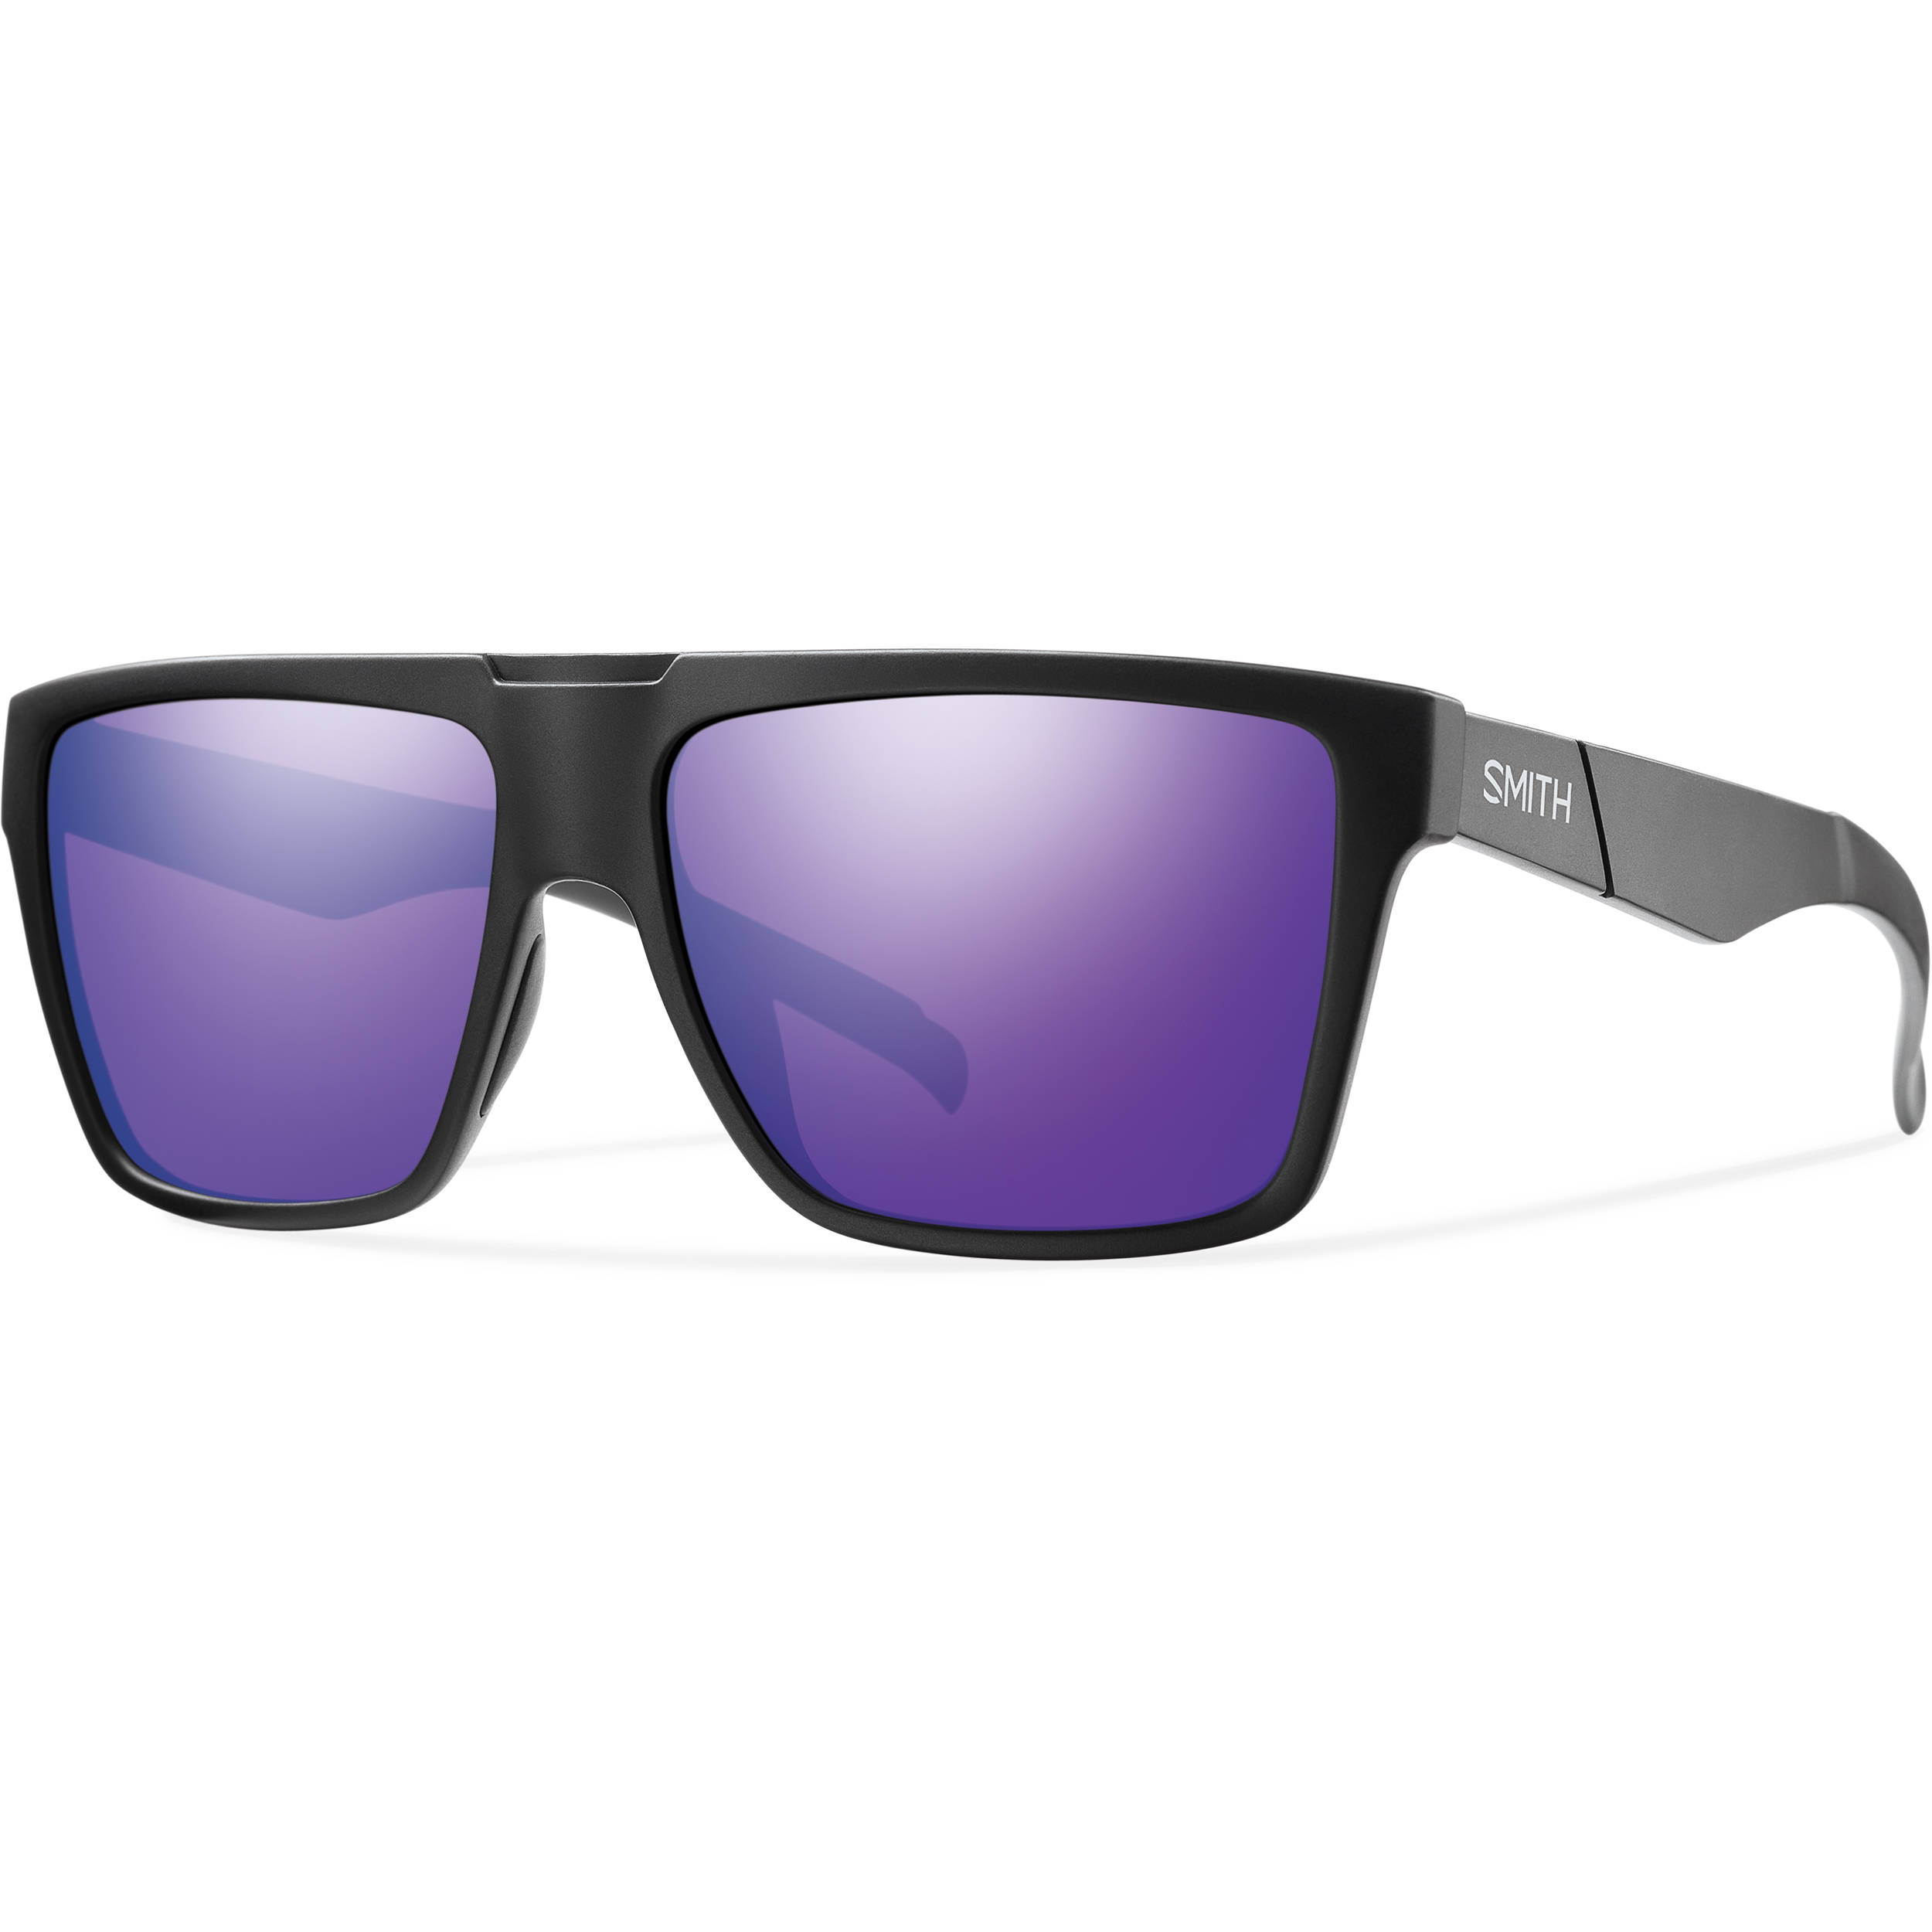 53397da745 Smith Optics Men s Edgewood Sunglasses (Purple Sol-X Mirror Lenses   Matte  Black Frames)